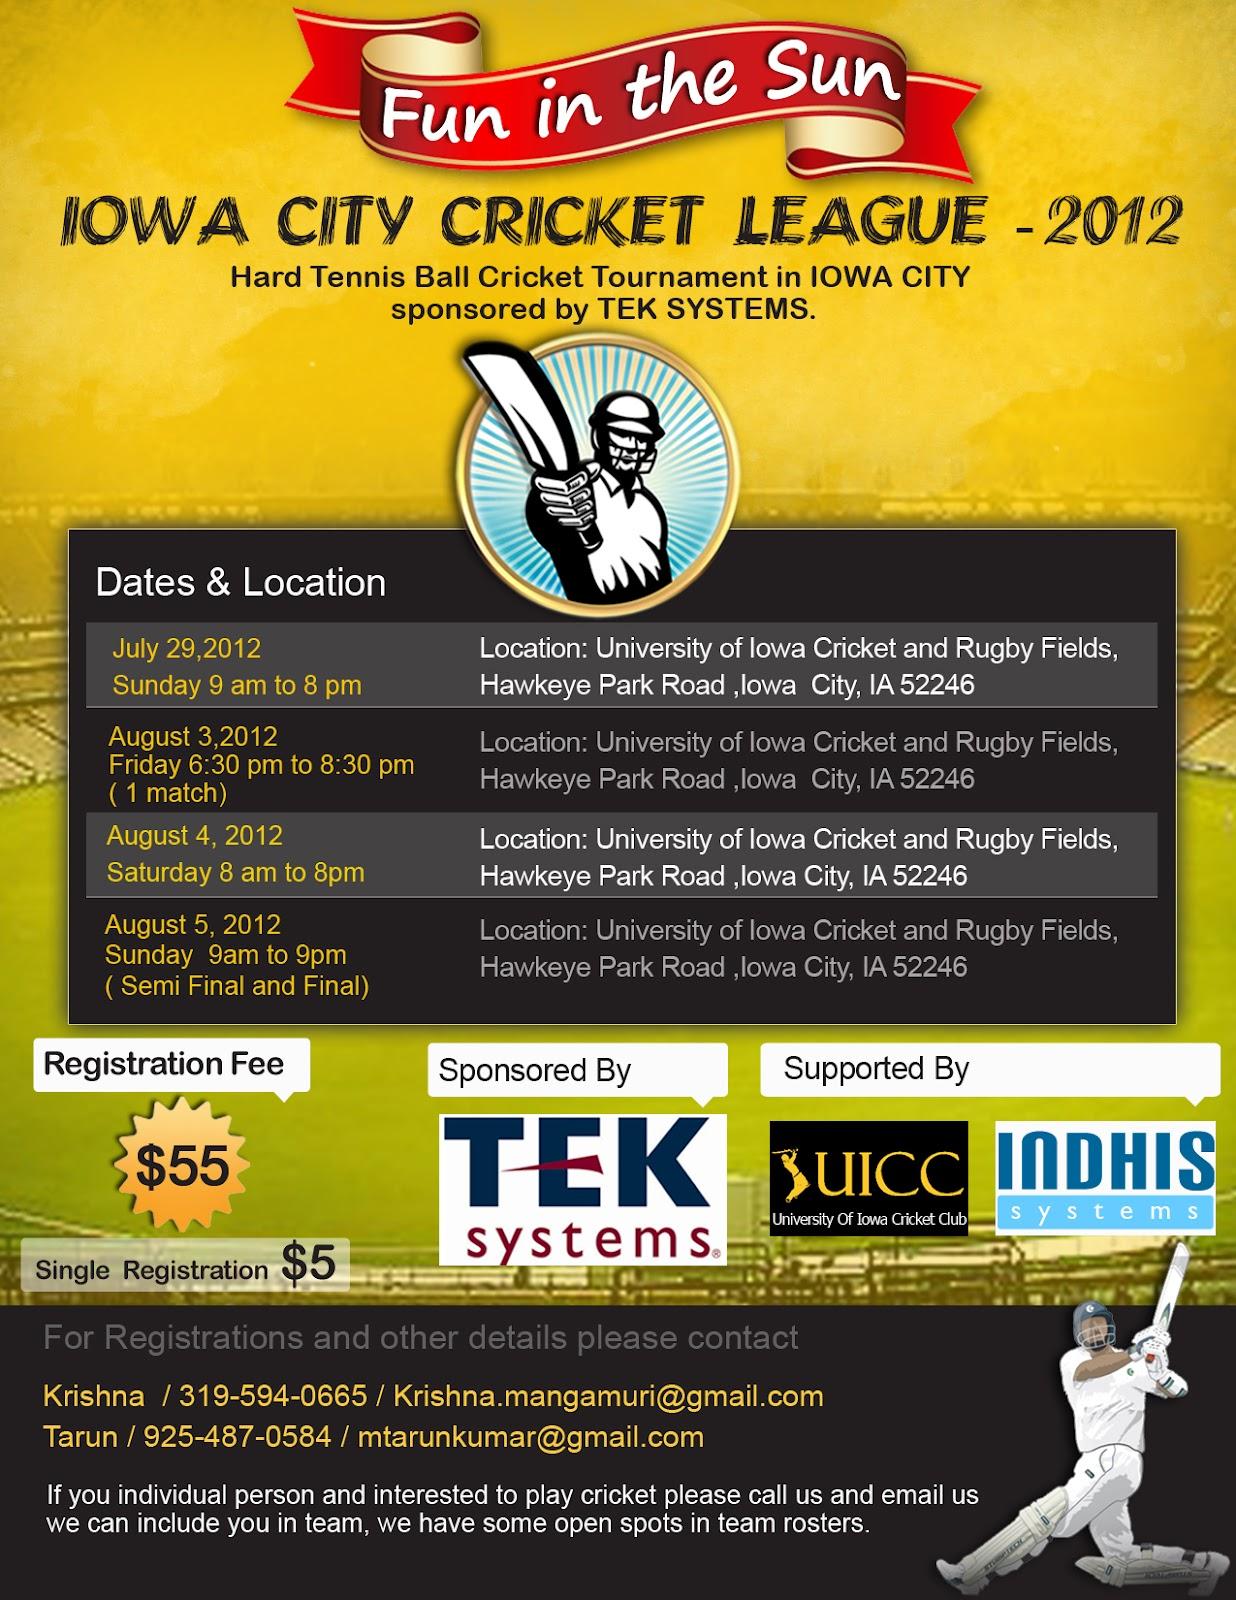 Iowa City Cricket League 2012: Hard Tennis Ball Cricket